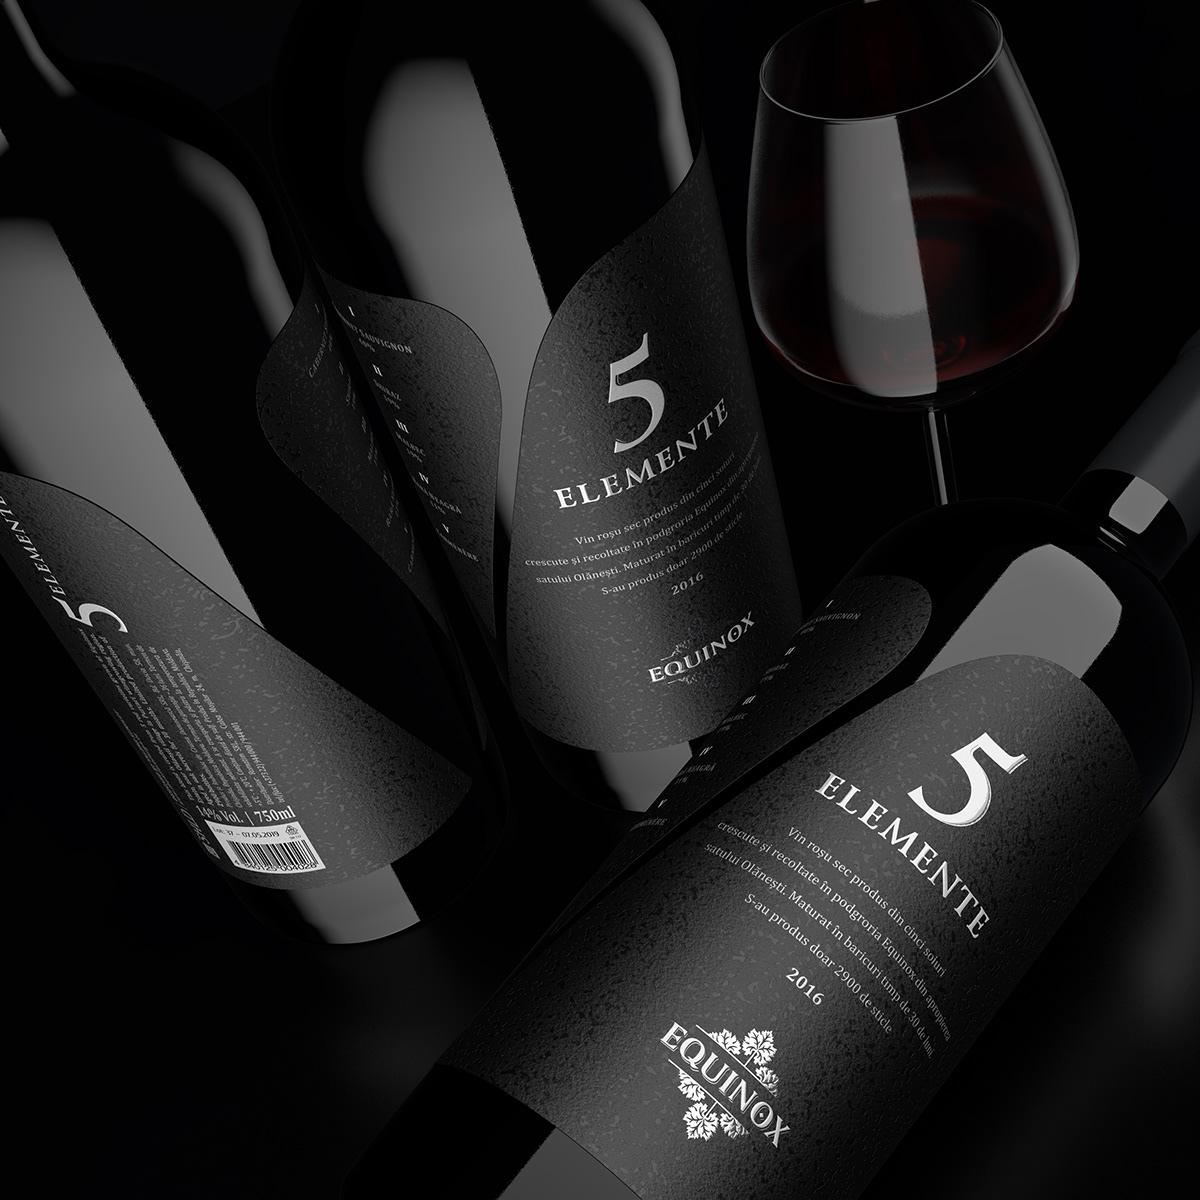 shumi shumilovedesign valerii sumilov branding  design Label labeling agency